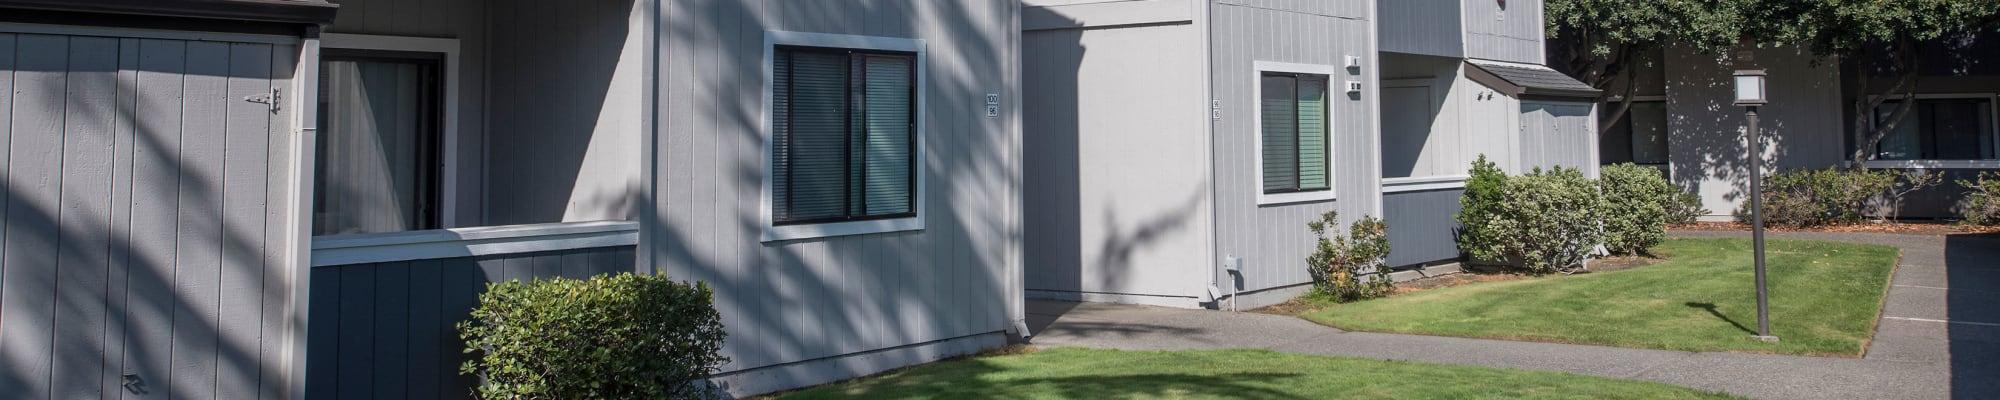 Resident perks at Park Ridge Apartment Homes in Rohnert Park, California